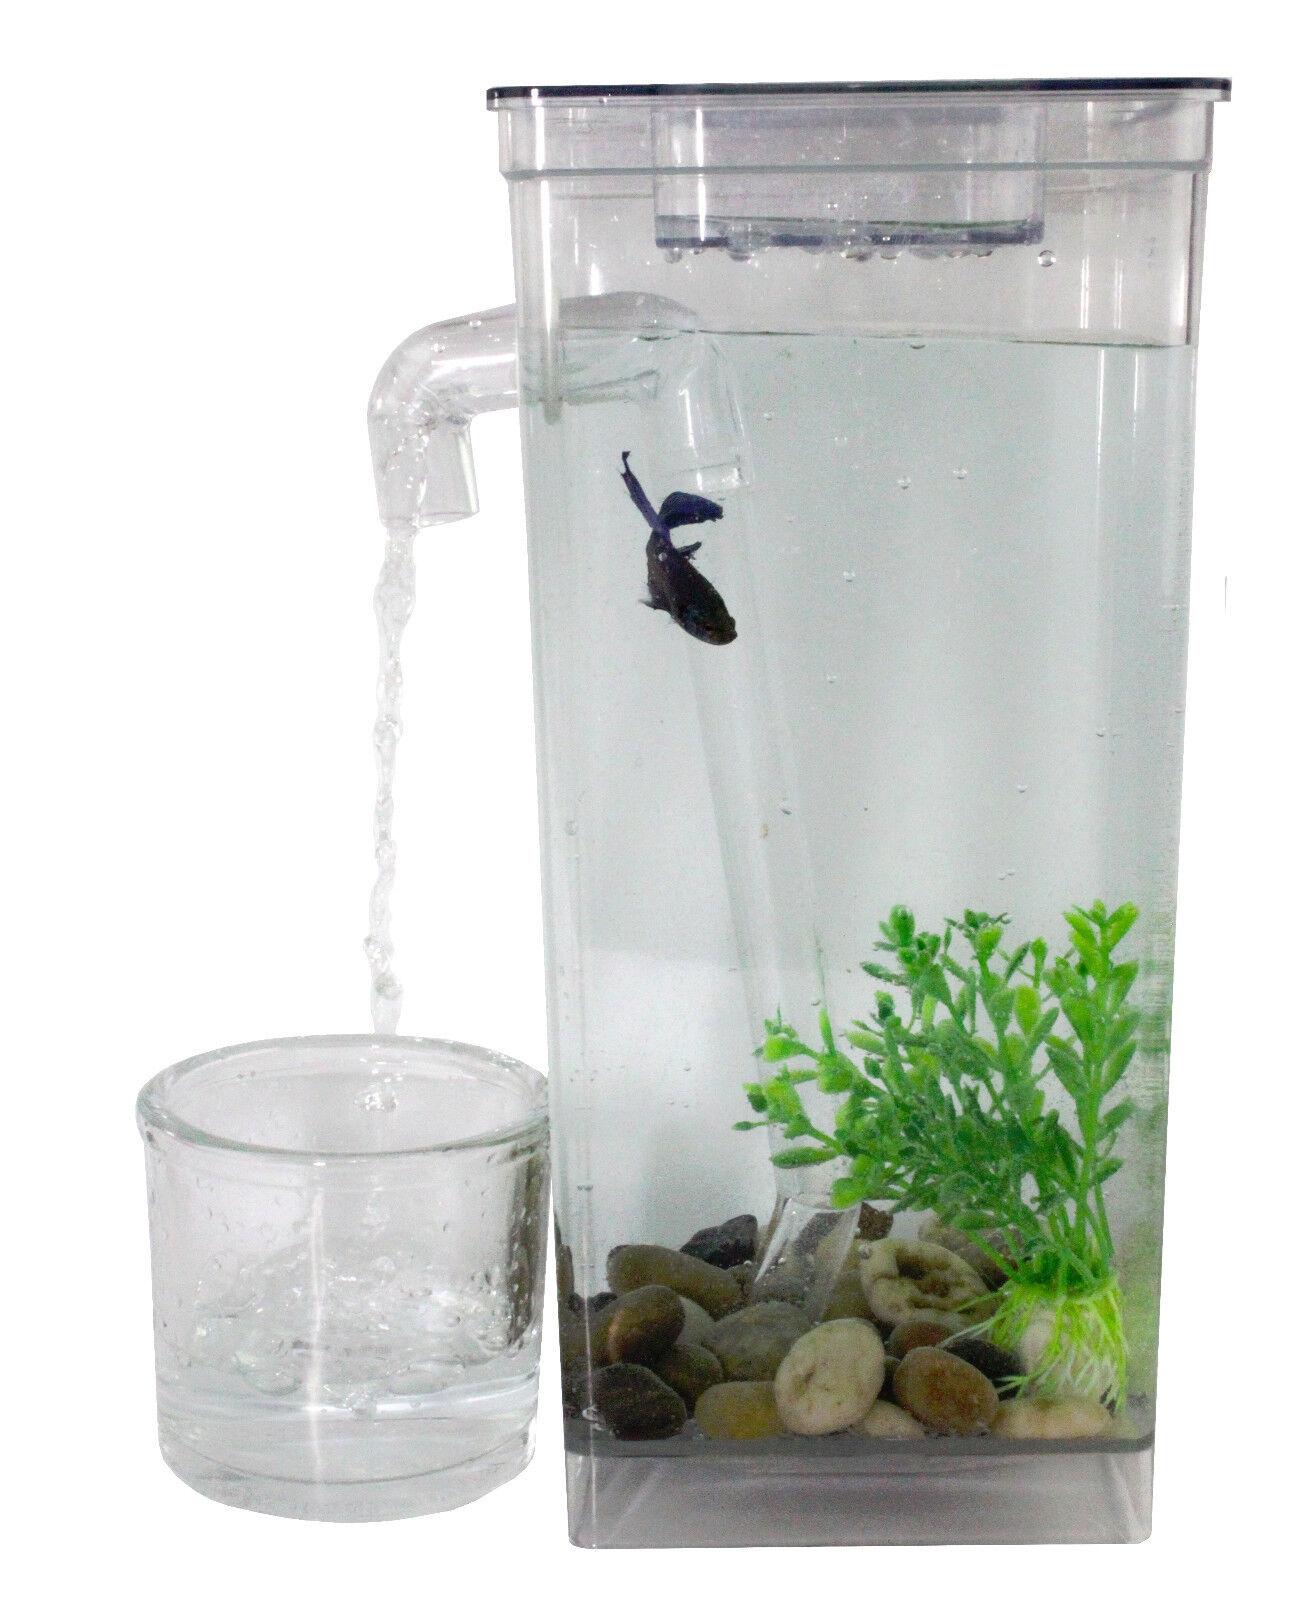 Self Cleaning Fun Fish Tank - Desktop Small Fish Aquarium w/ LED Light On TV